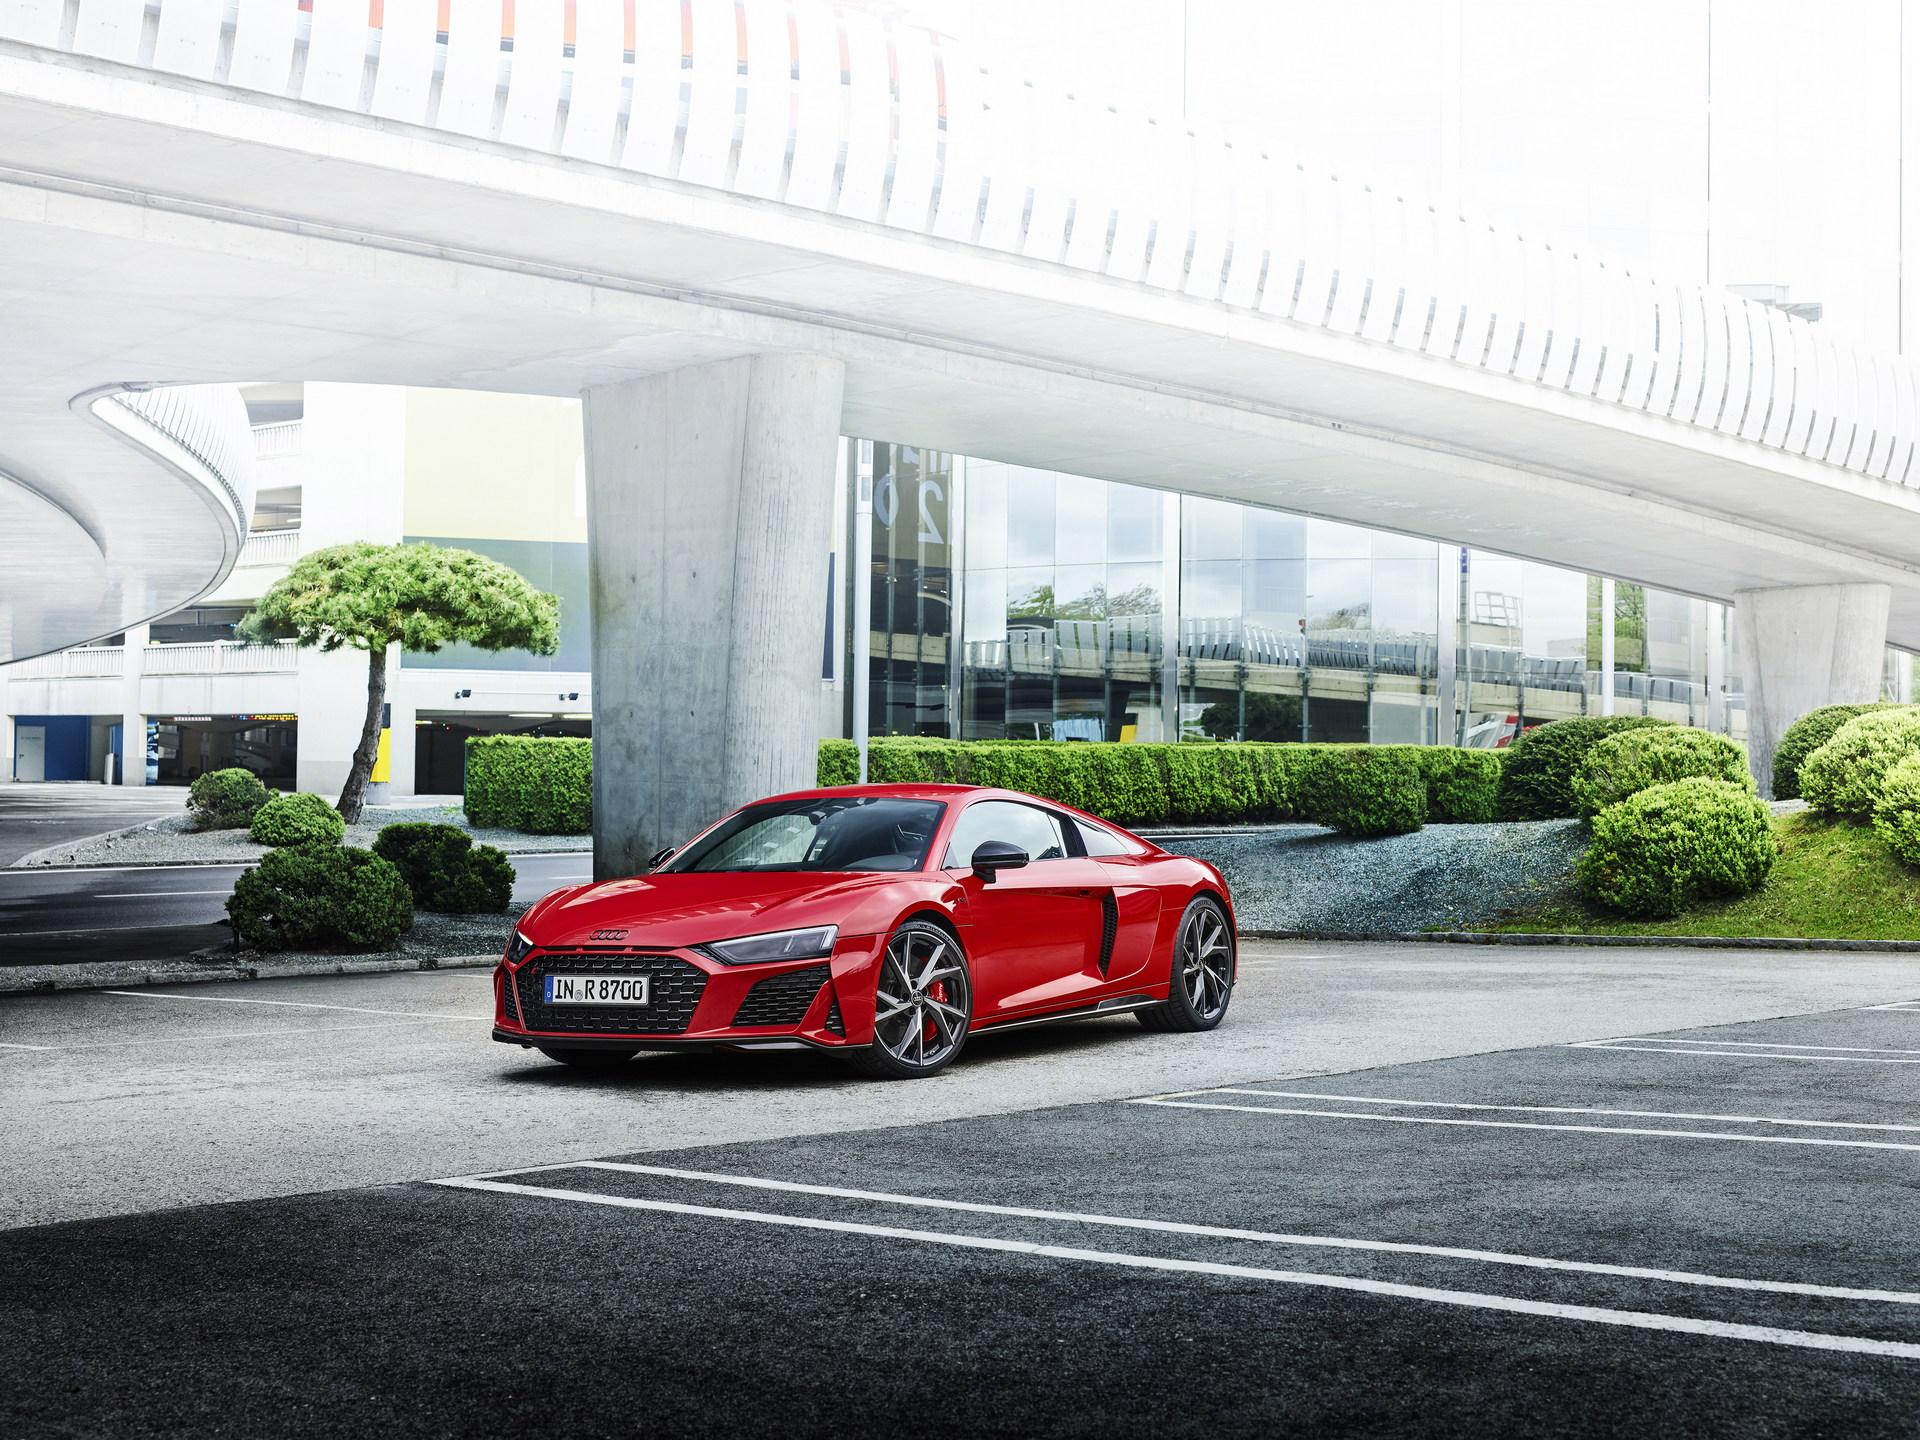 2022-Audi-R8-V10-Performance-RWD-14